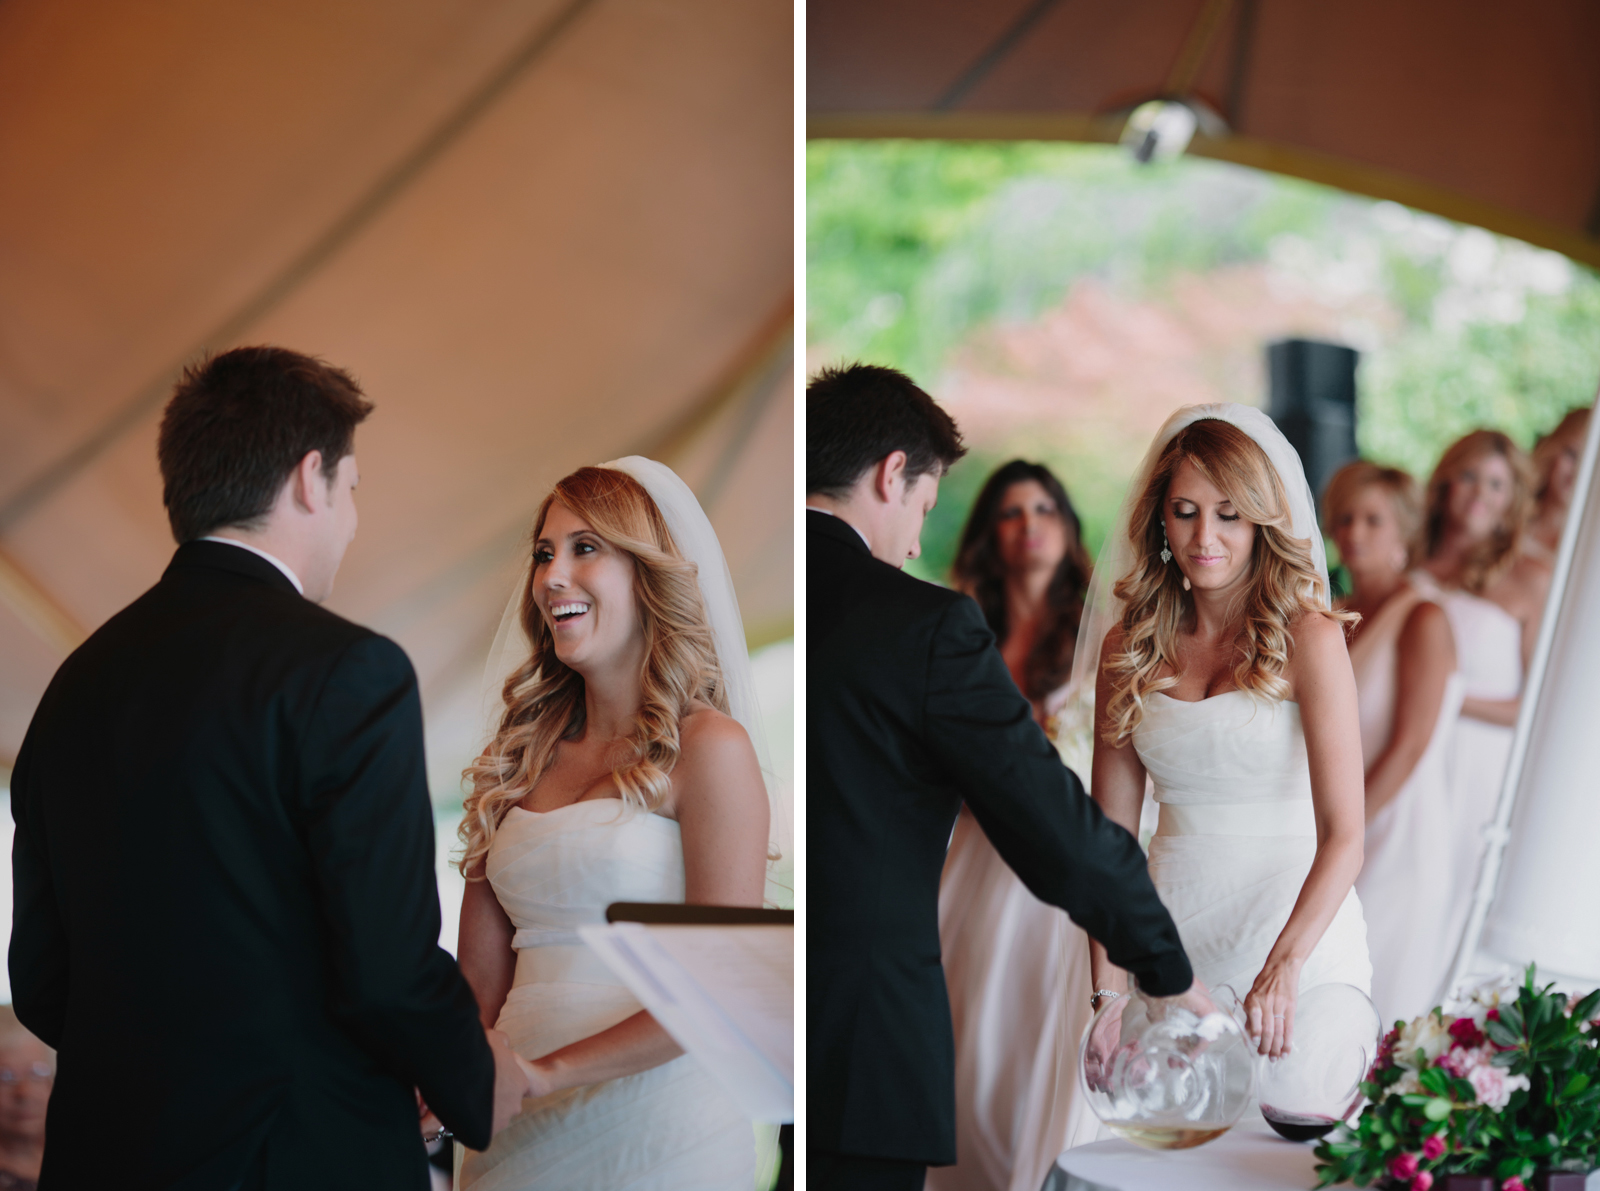 Northern Michigan Grand Traverse Resort Black Tie Wedding Photographer - Codee and Aaron-016.jpg